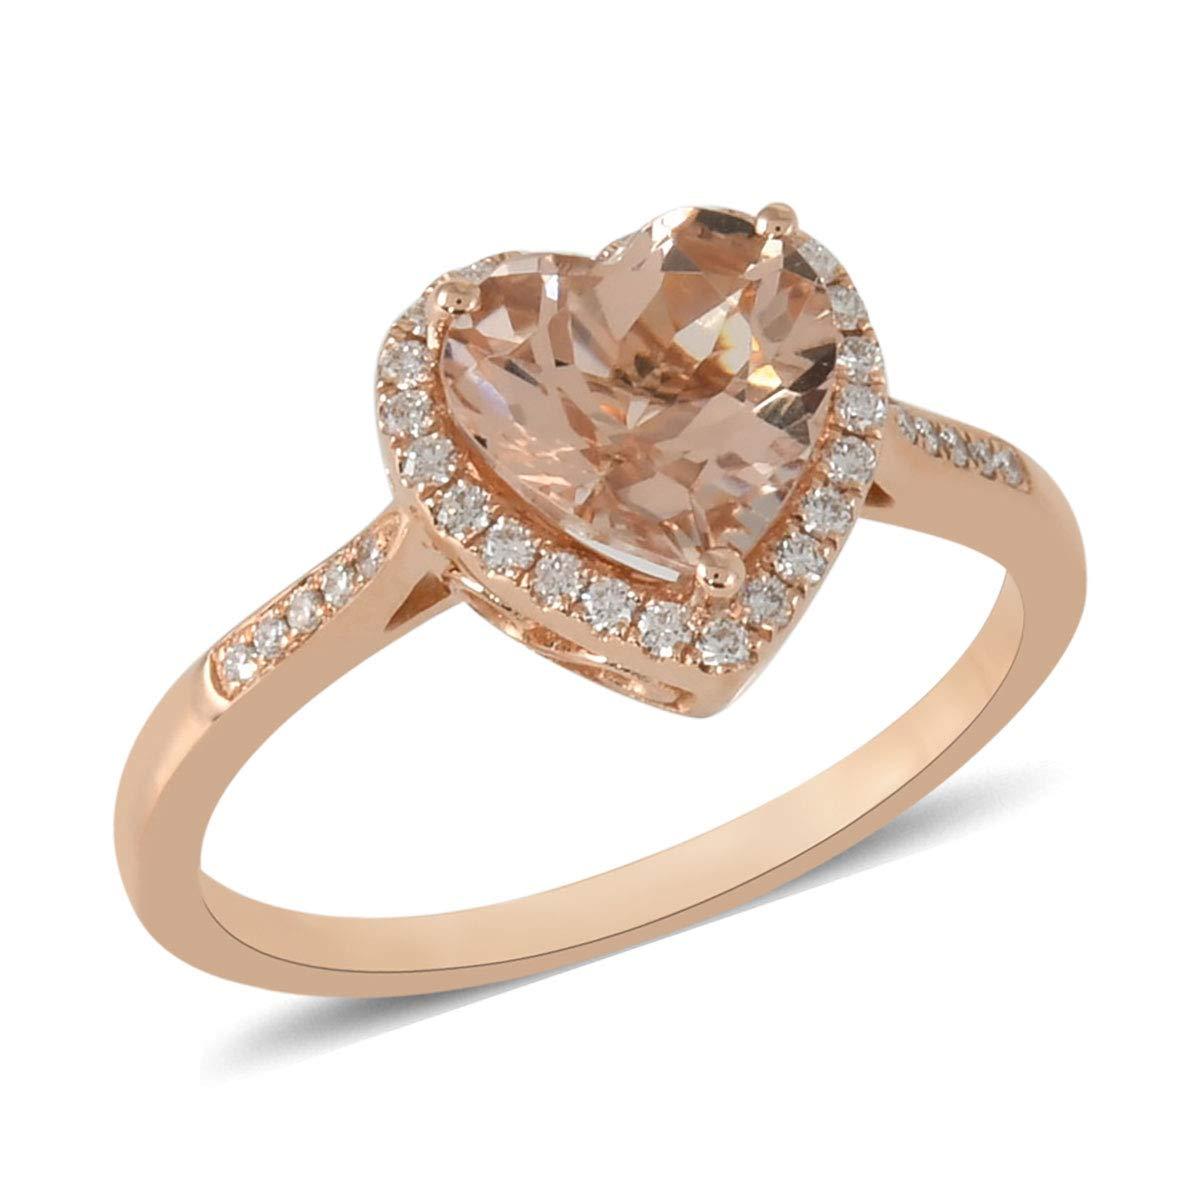 ILIANA 18K Rose Gold Premium AAA Morganite Diamond Halo Ring Jewelry Gift for Women Ct 2 G-H Color SI1